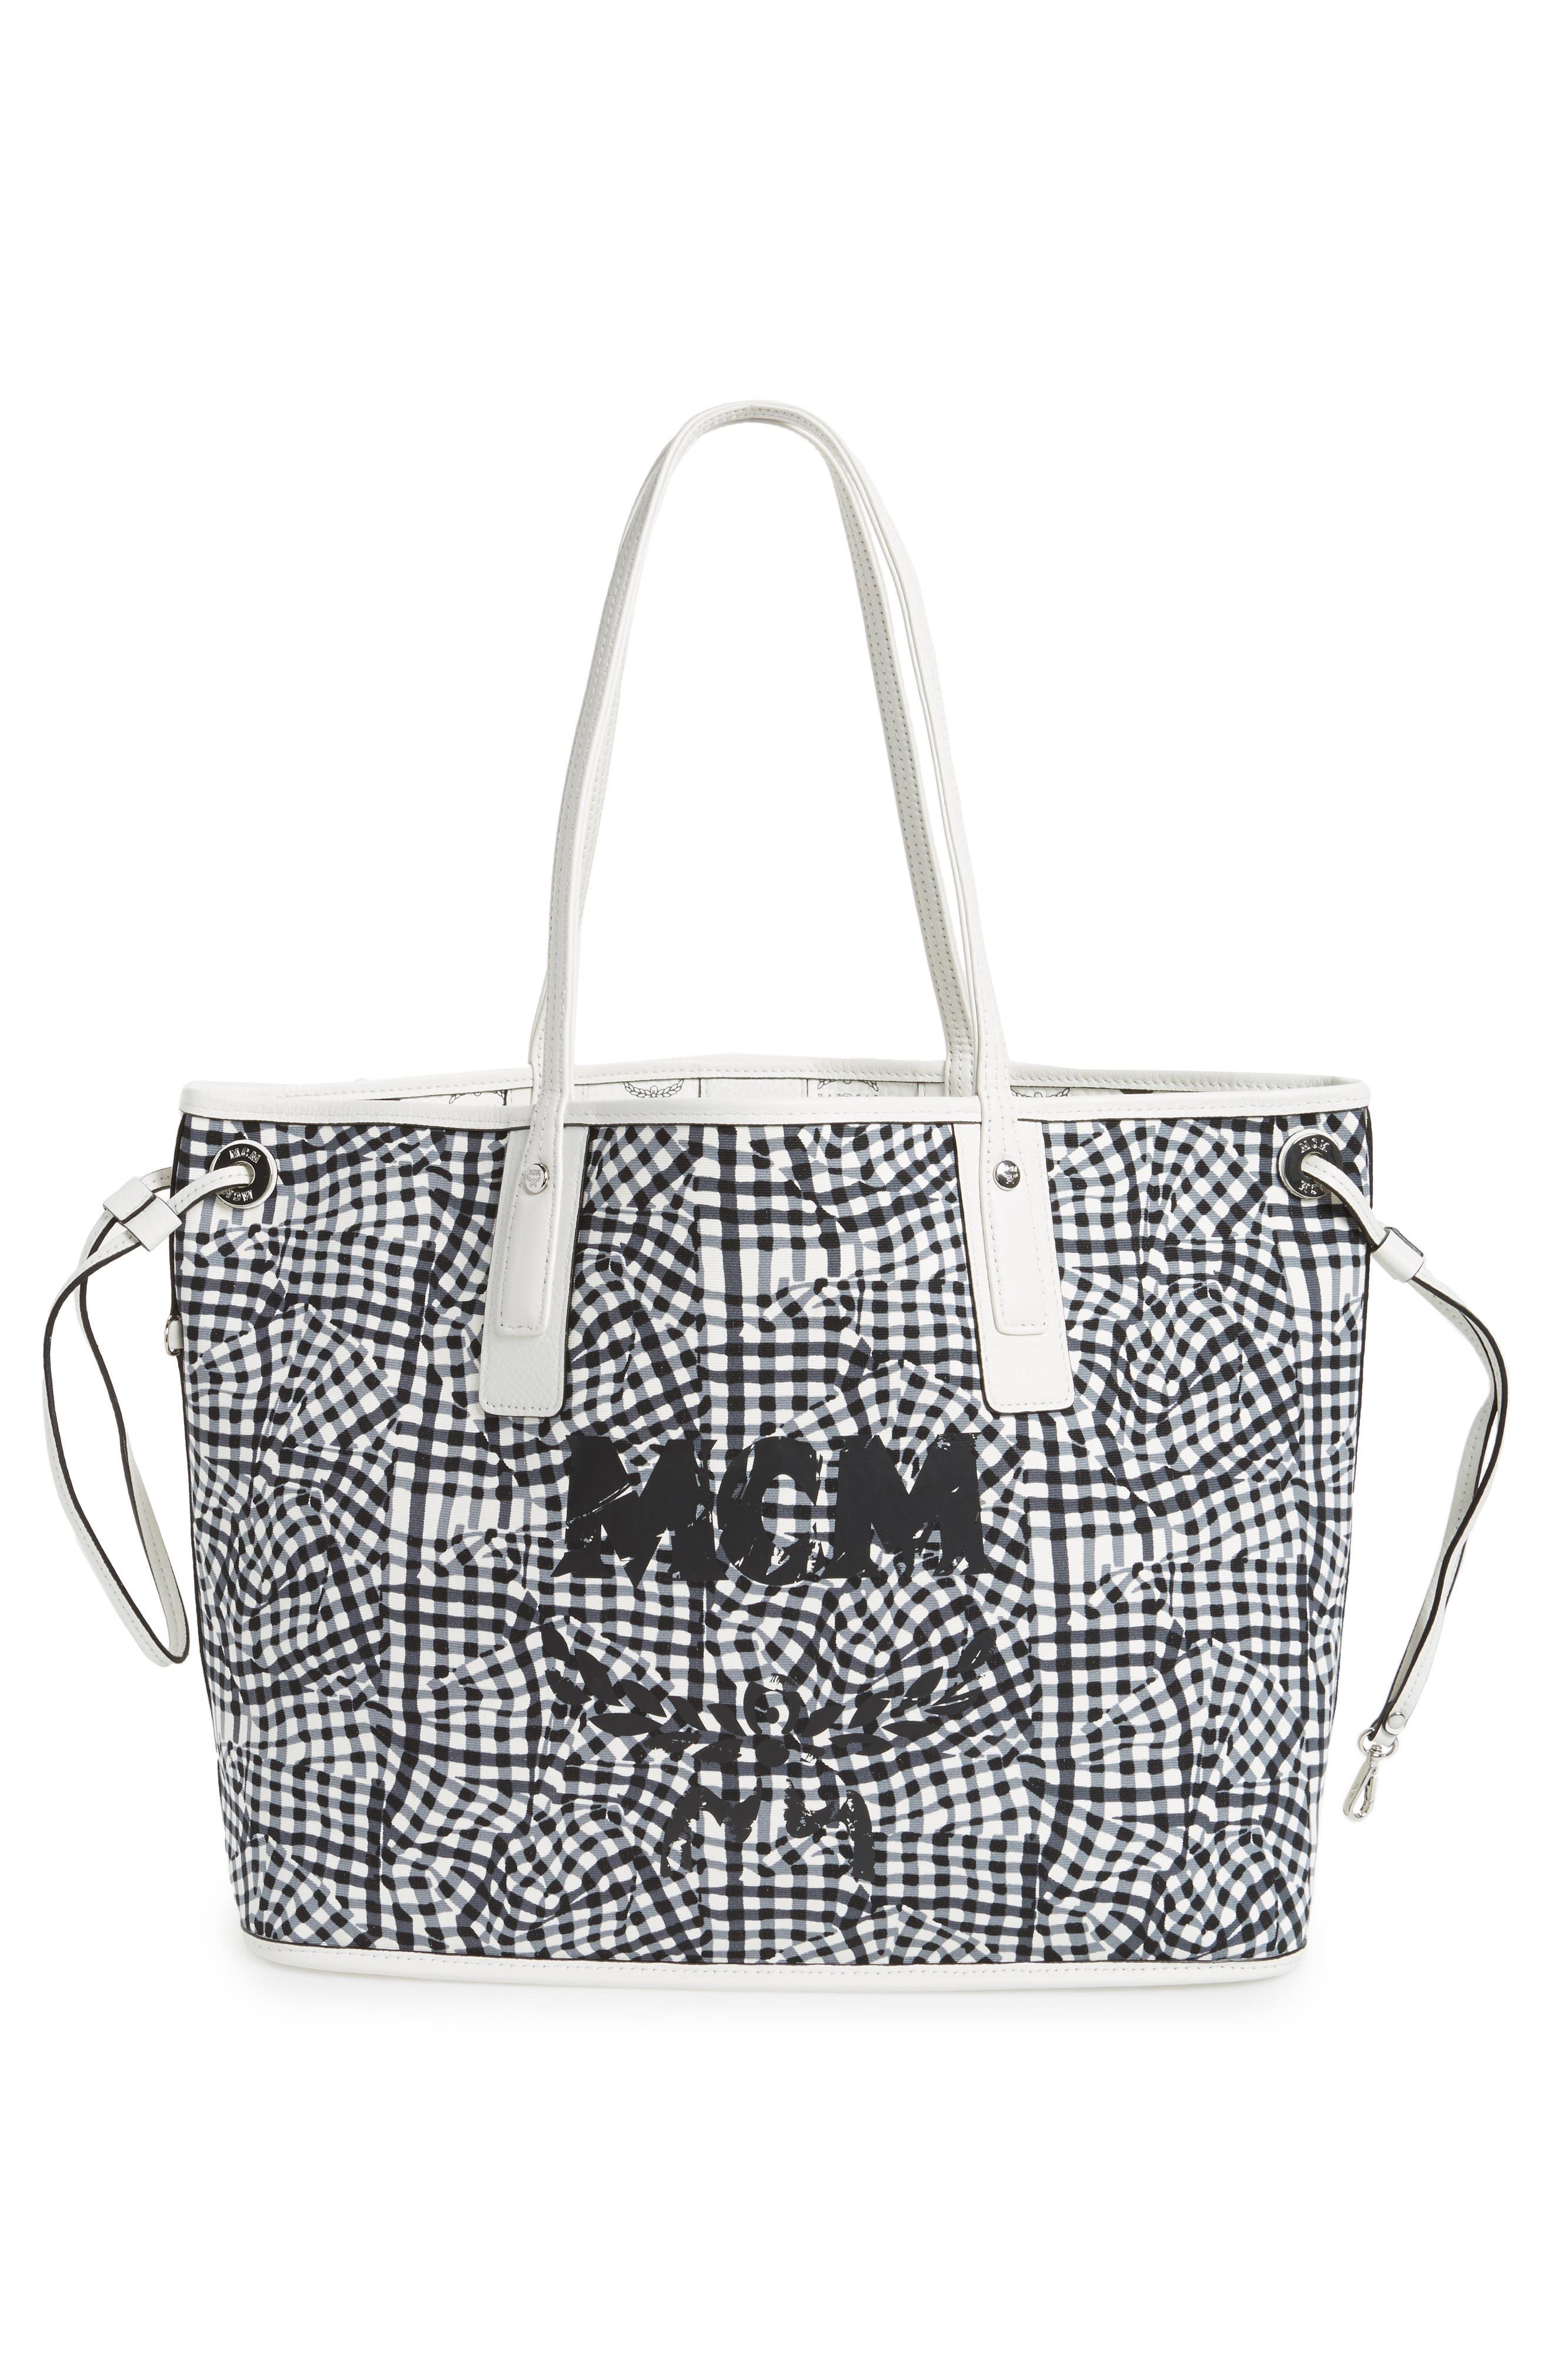 80d7bd71bf03 MCM Handbags   Wallets for Women